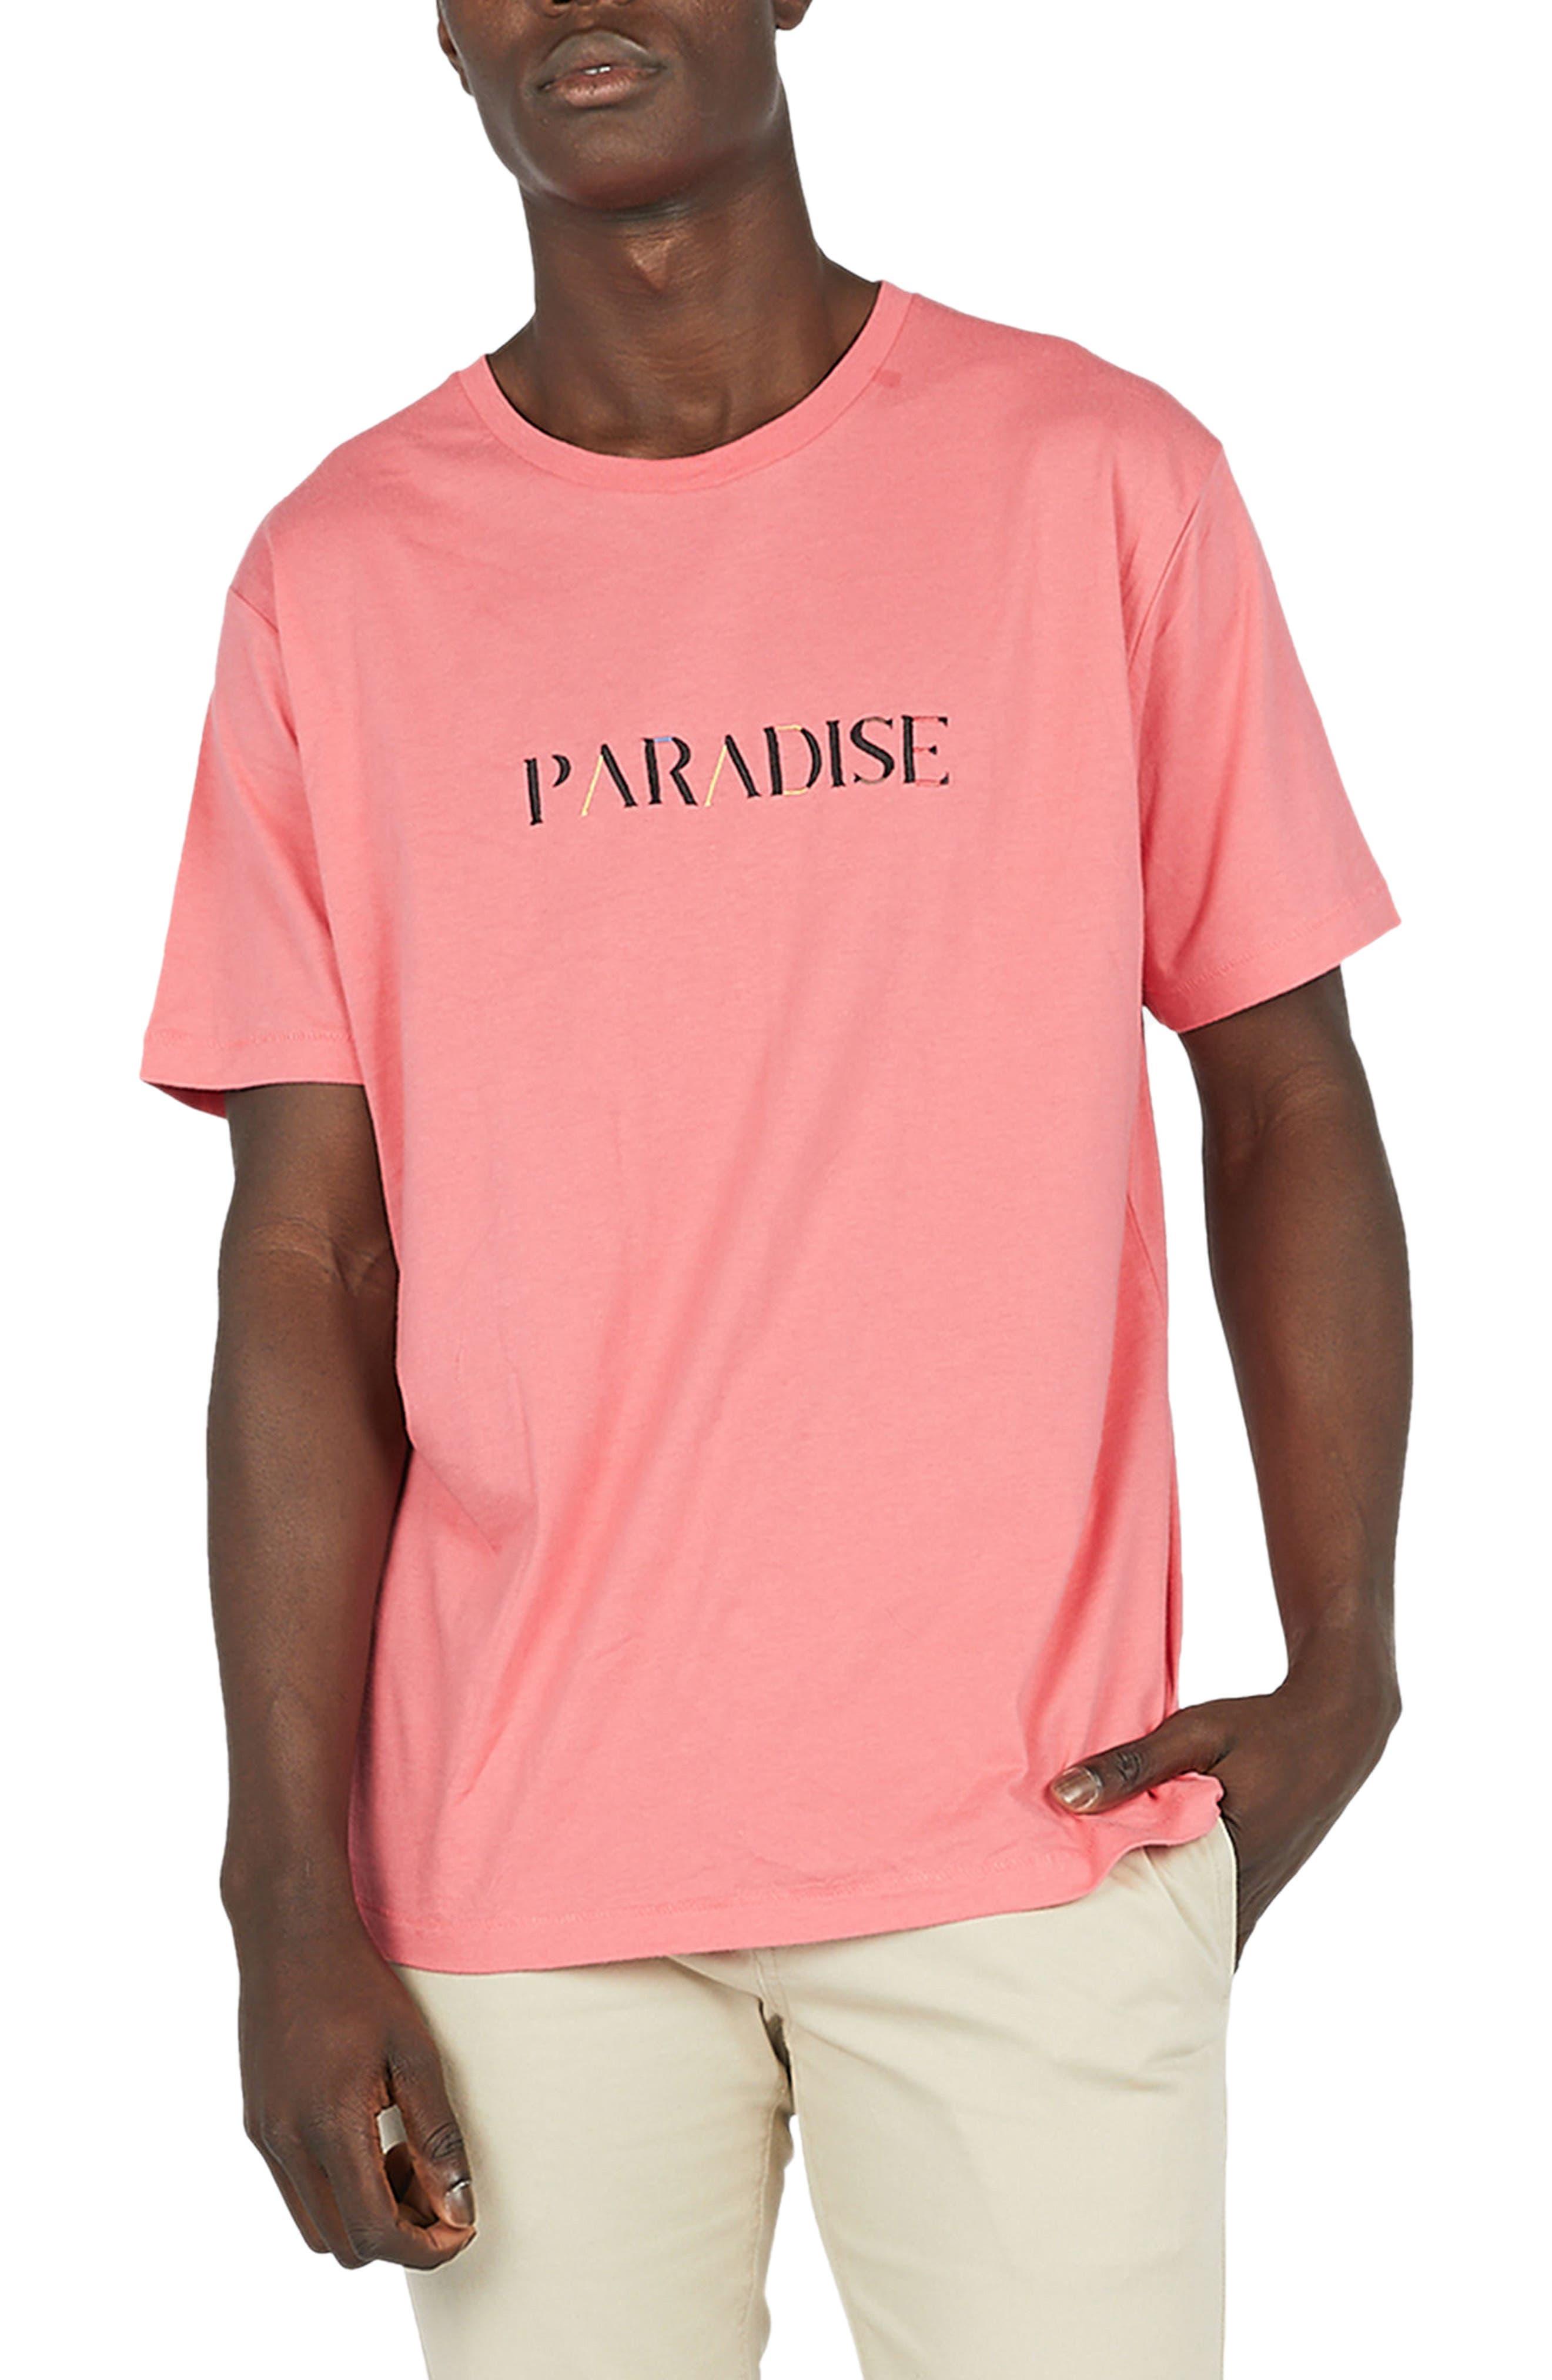 Paradise T-Shirt,                         Main,                         color, Coral Pink